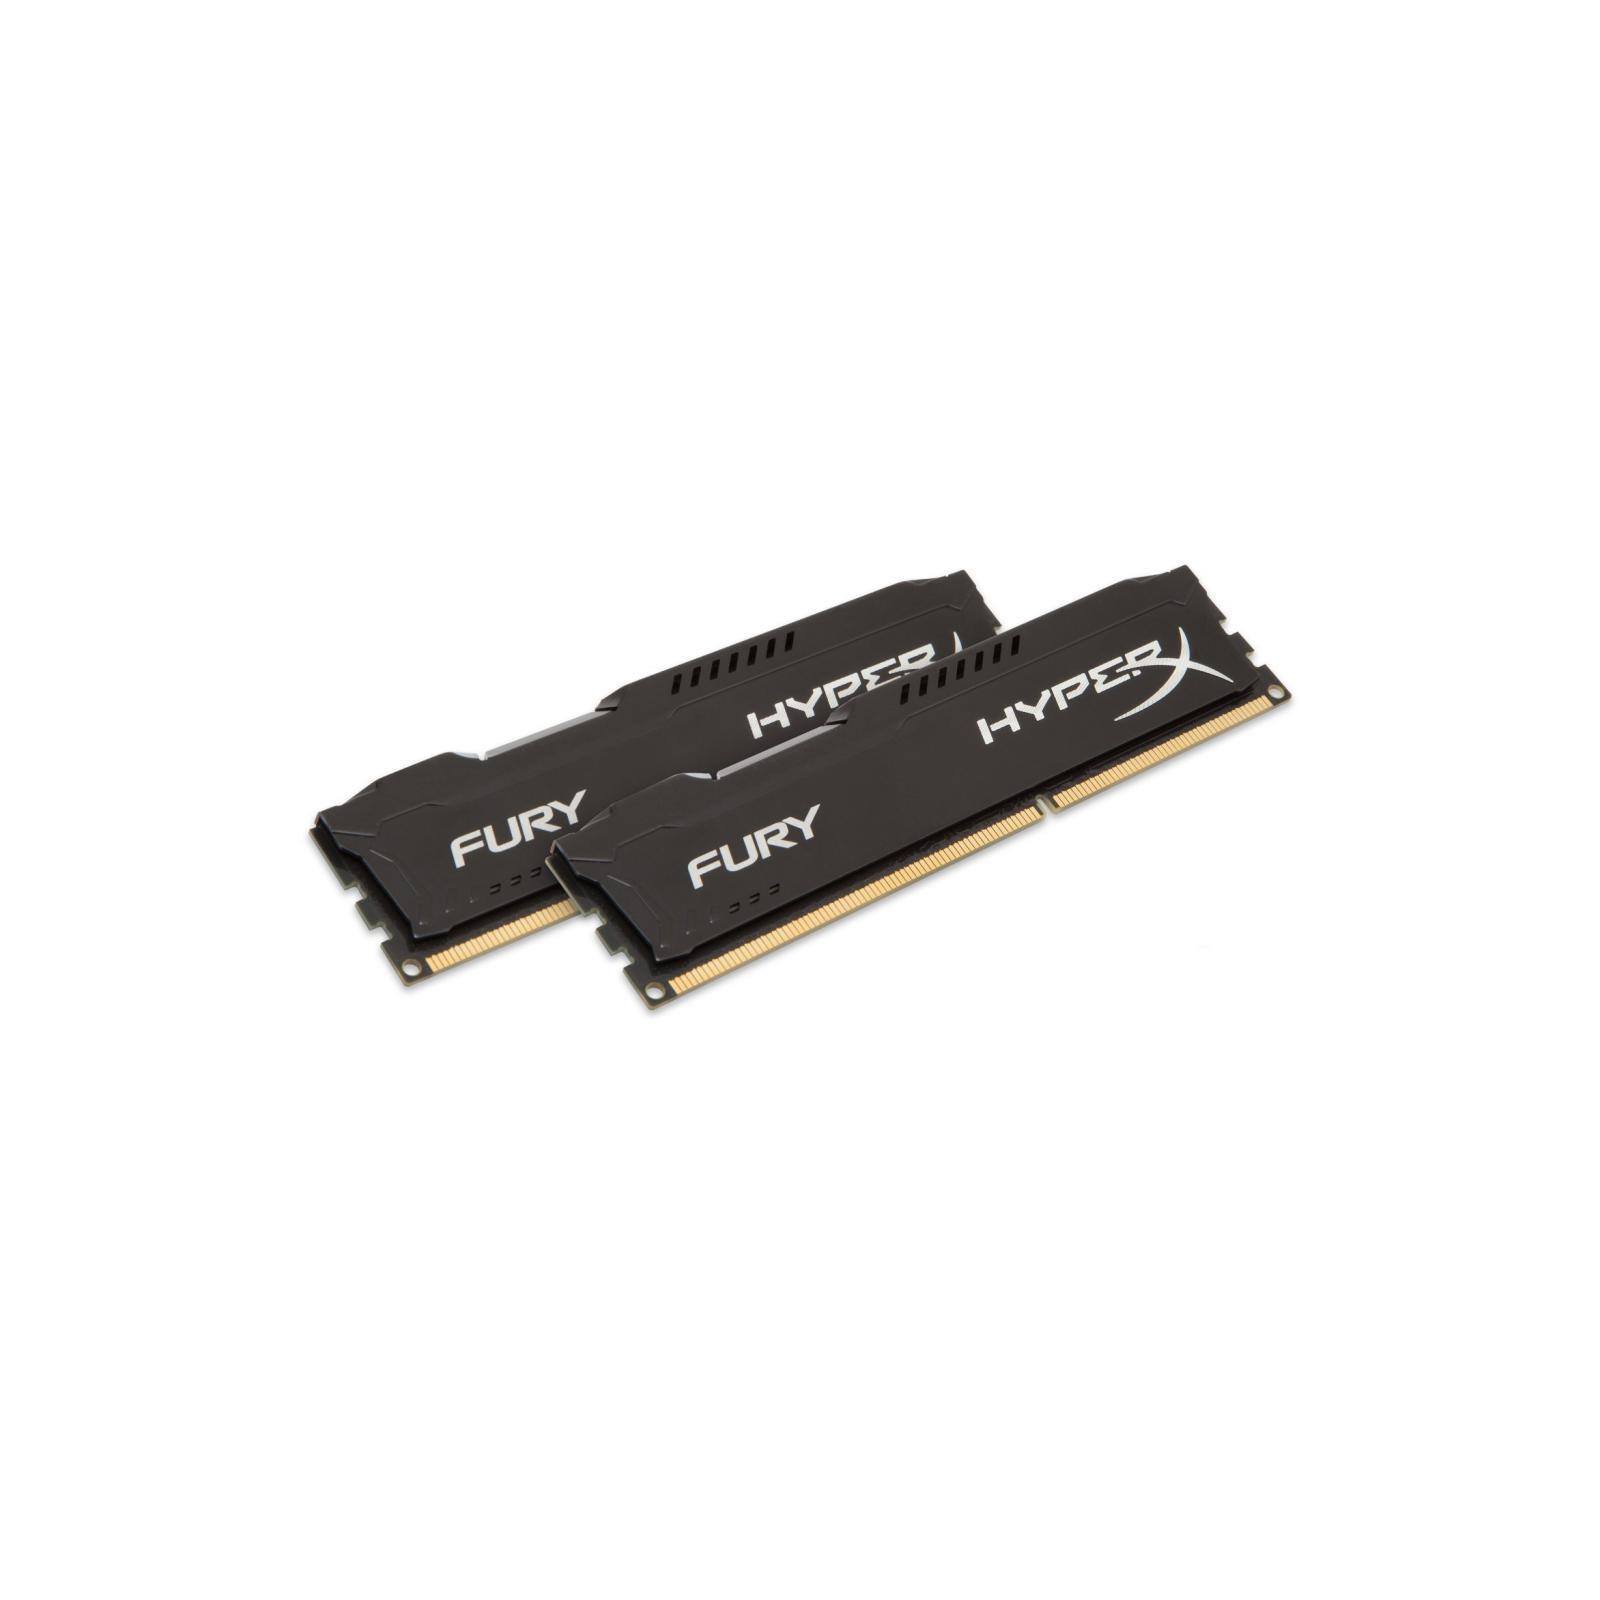 Модуль памяти для компьютера DDR4 32GB (2x16GB) 2933 MHz HyperX FURY Black HyperX (Kingston Fury) (HX429C17FBK2/32) изображение 2